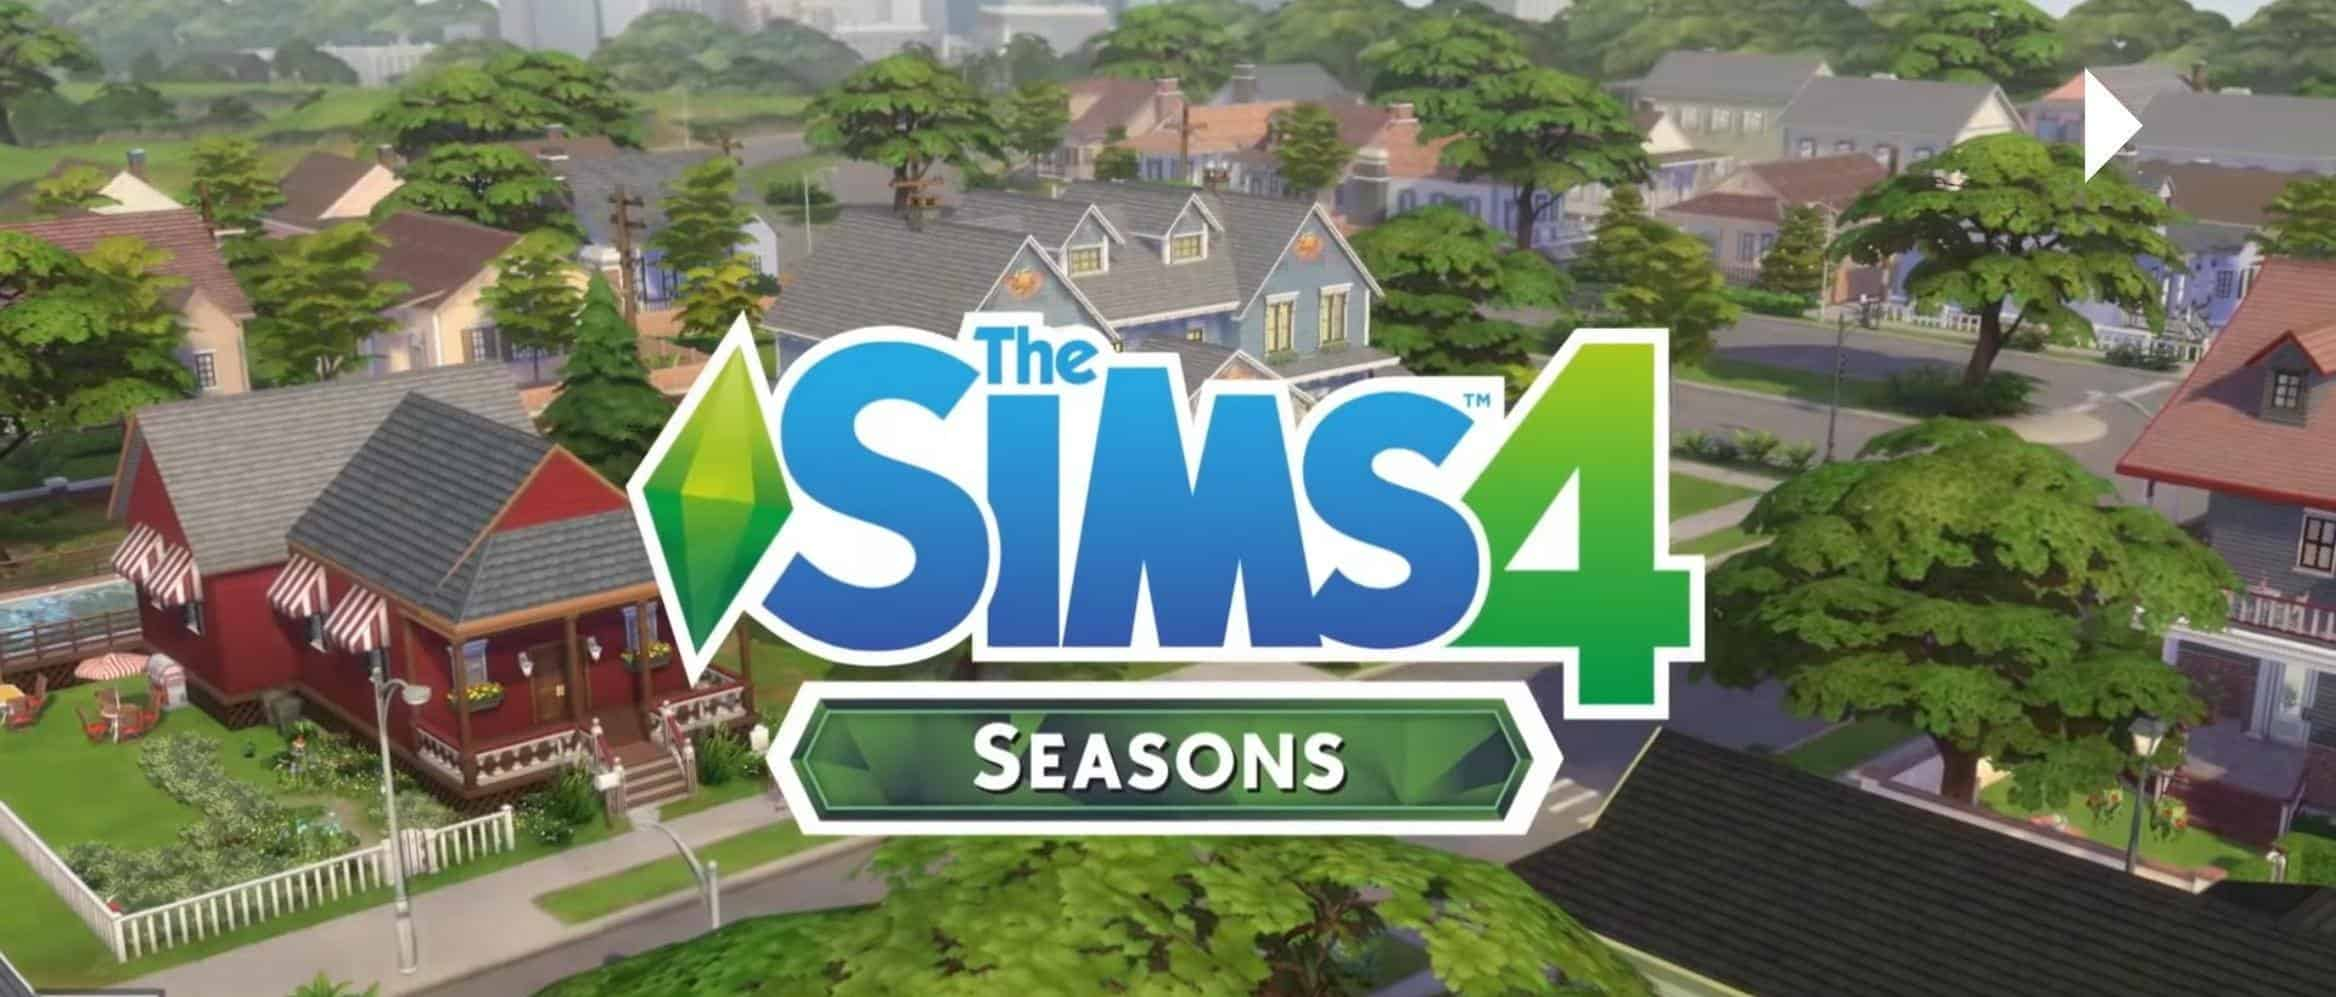 The Sims 4 Seasons herunterladen frei PC